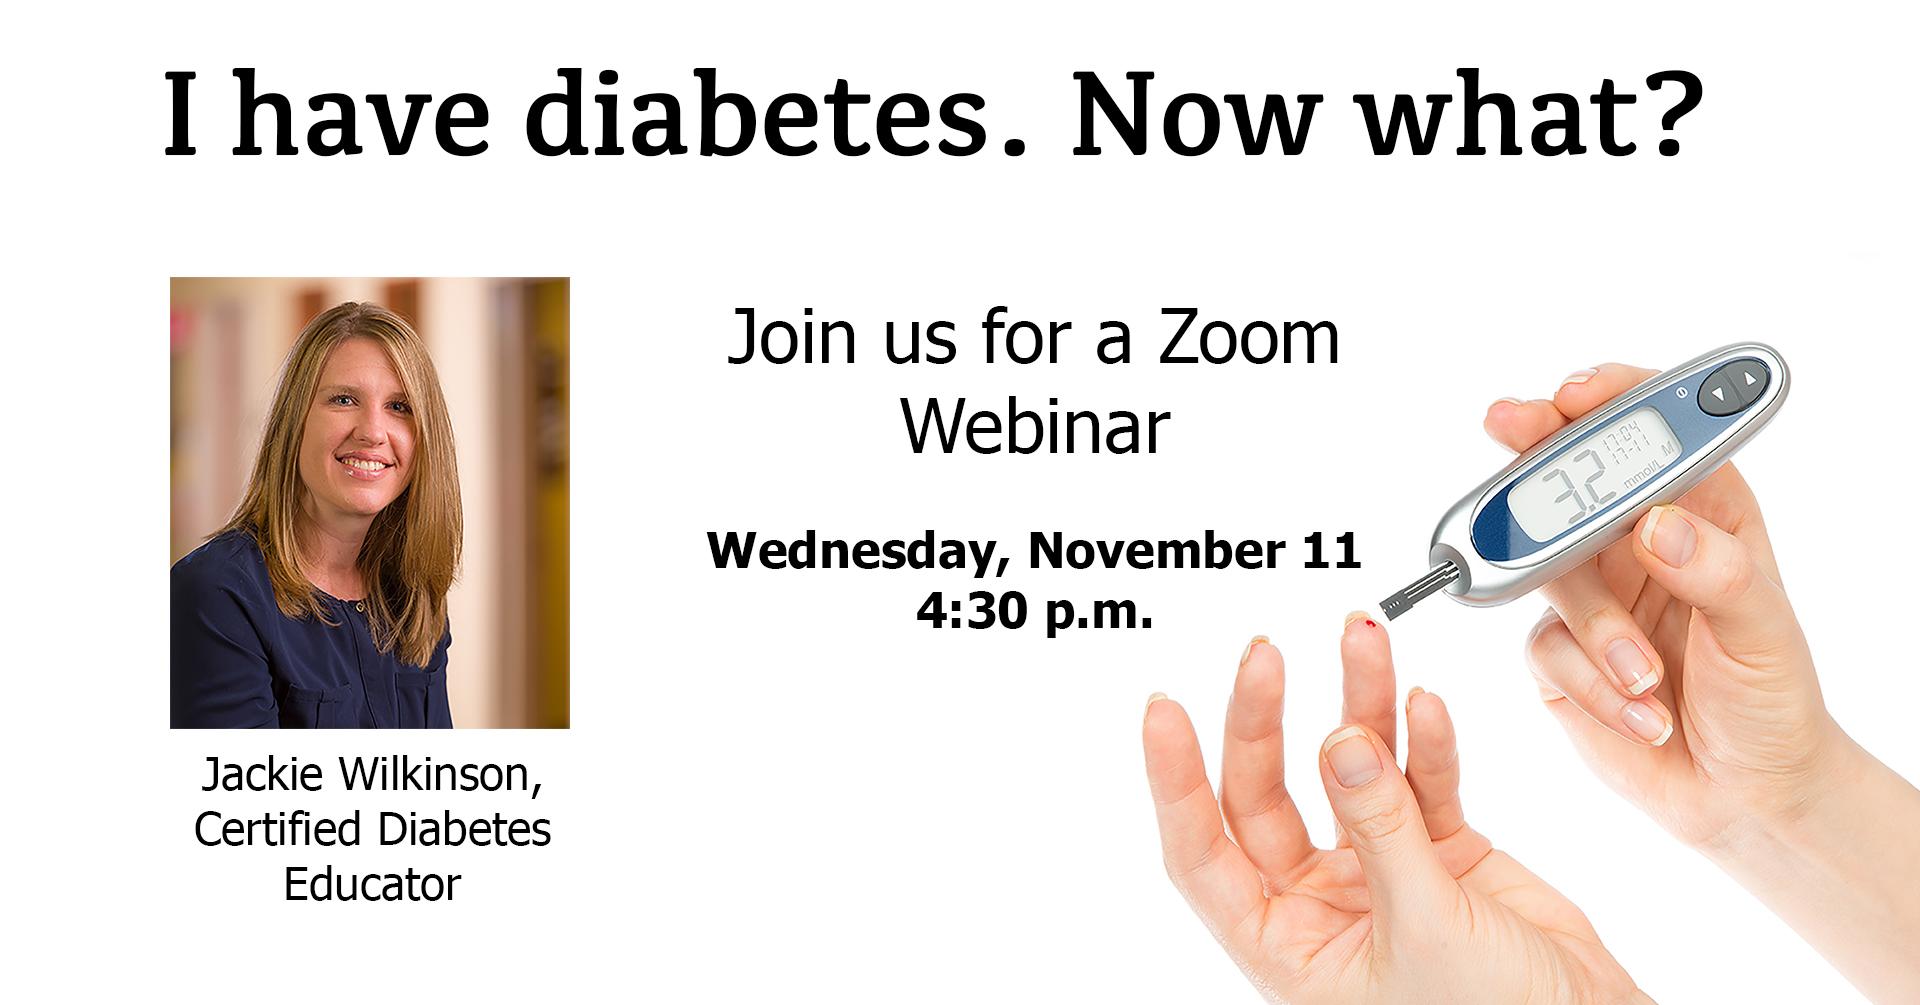 I have diabetes. Now what? Diabetes Education Webinar